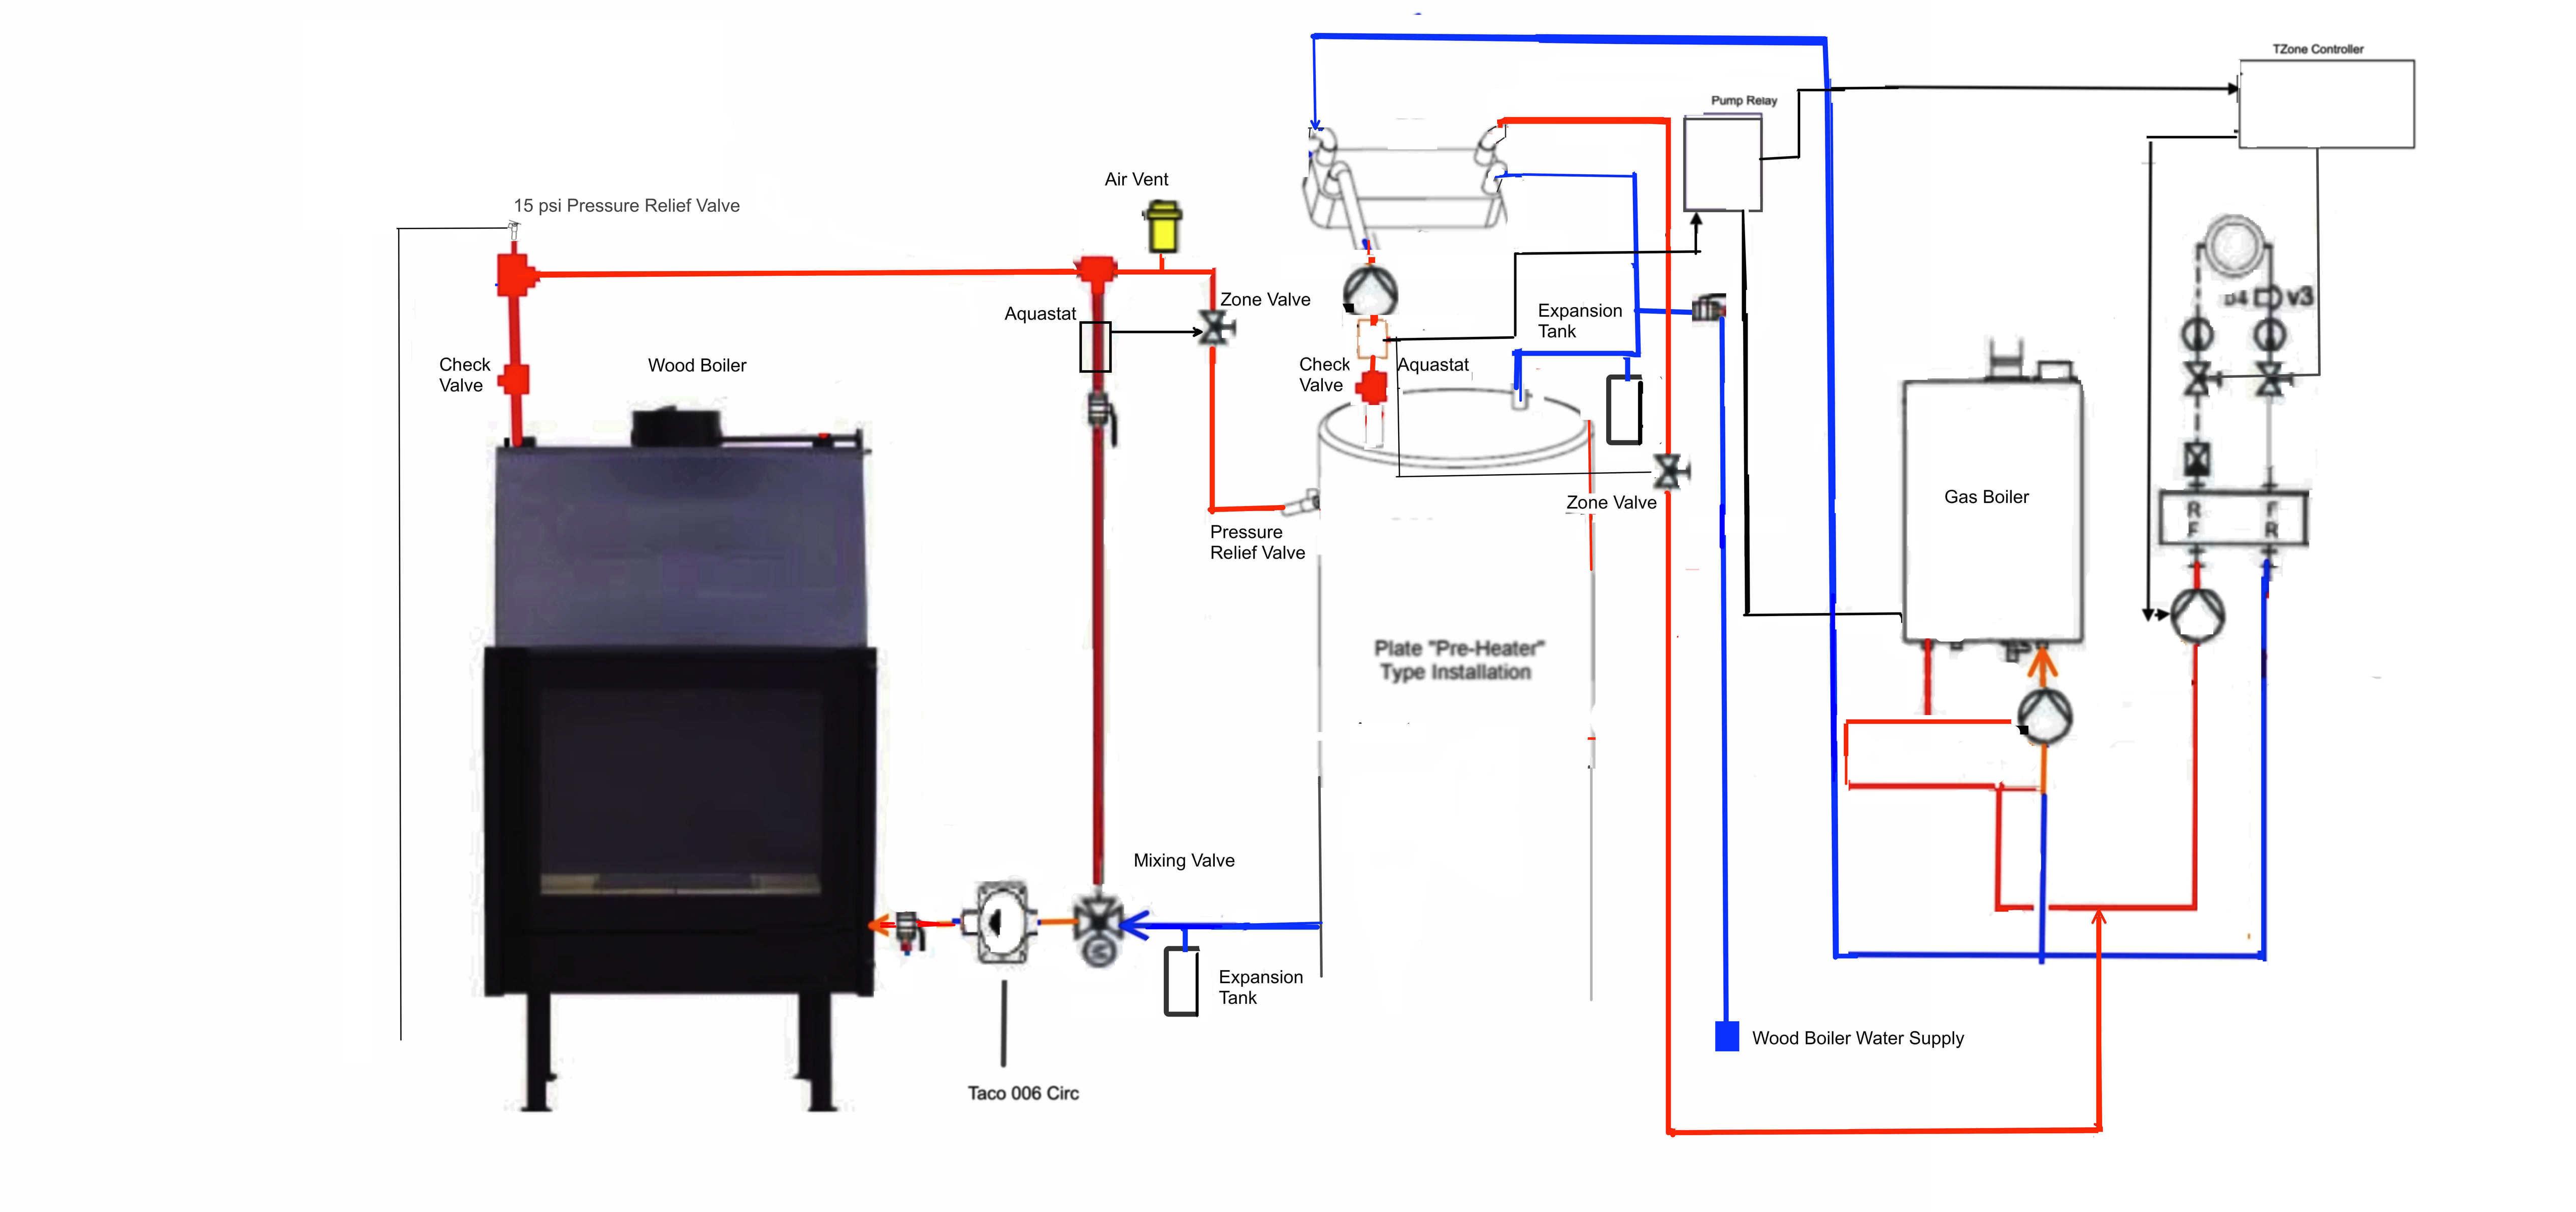 aquastat wiring diagram    wiring    plan for fireplace boiler twinsprings research     wiring    plan for fireplace boiler twinsprings research